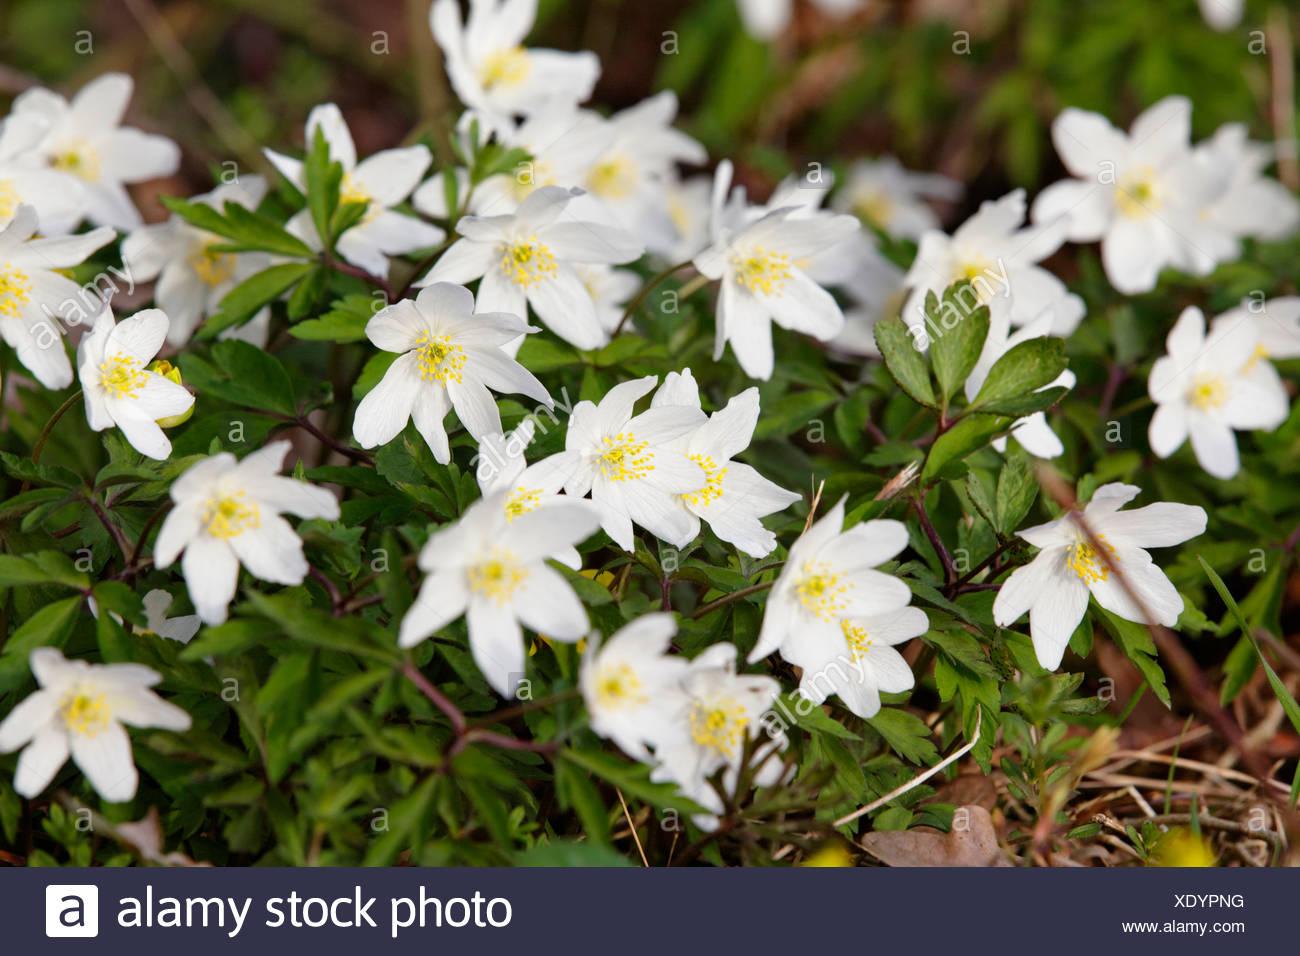 Legno anemone, Windflower, Thimbleweed o odore fox (Anemone nemorosa ,), Allier, Francia, Europa Immagini Stock